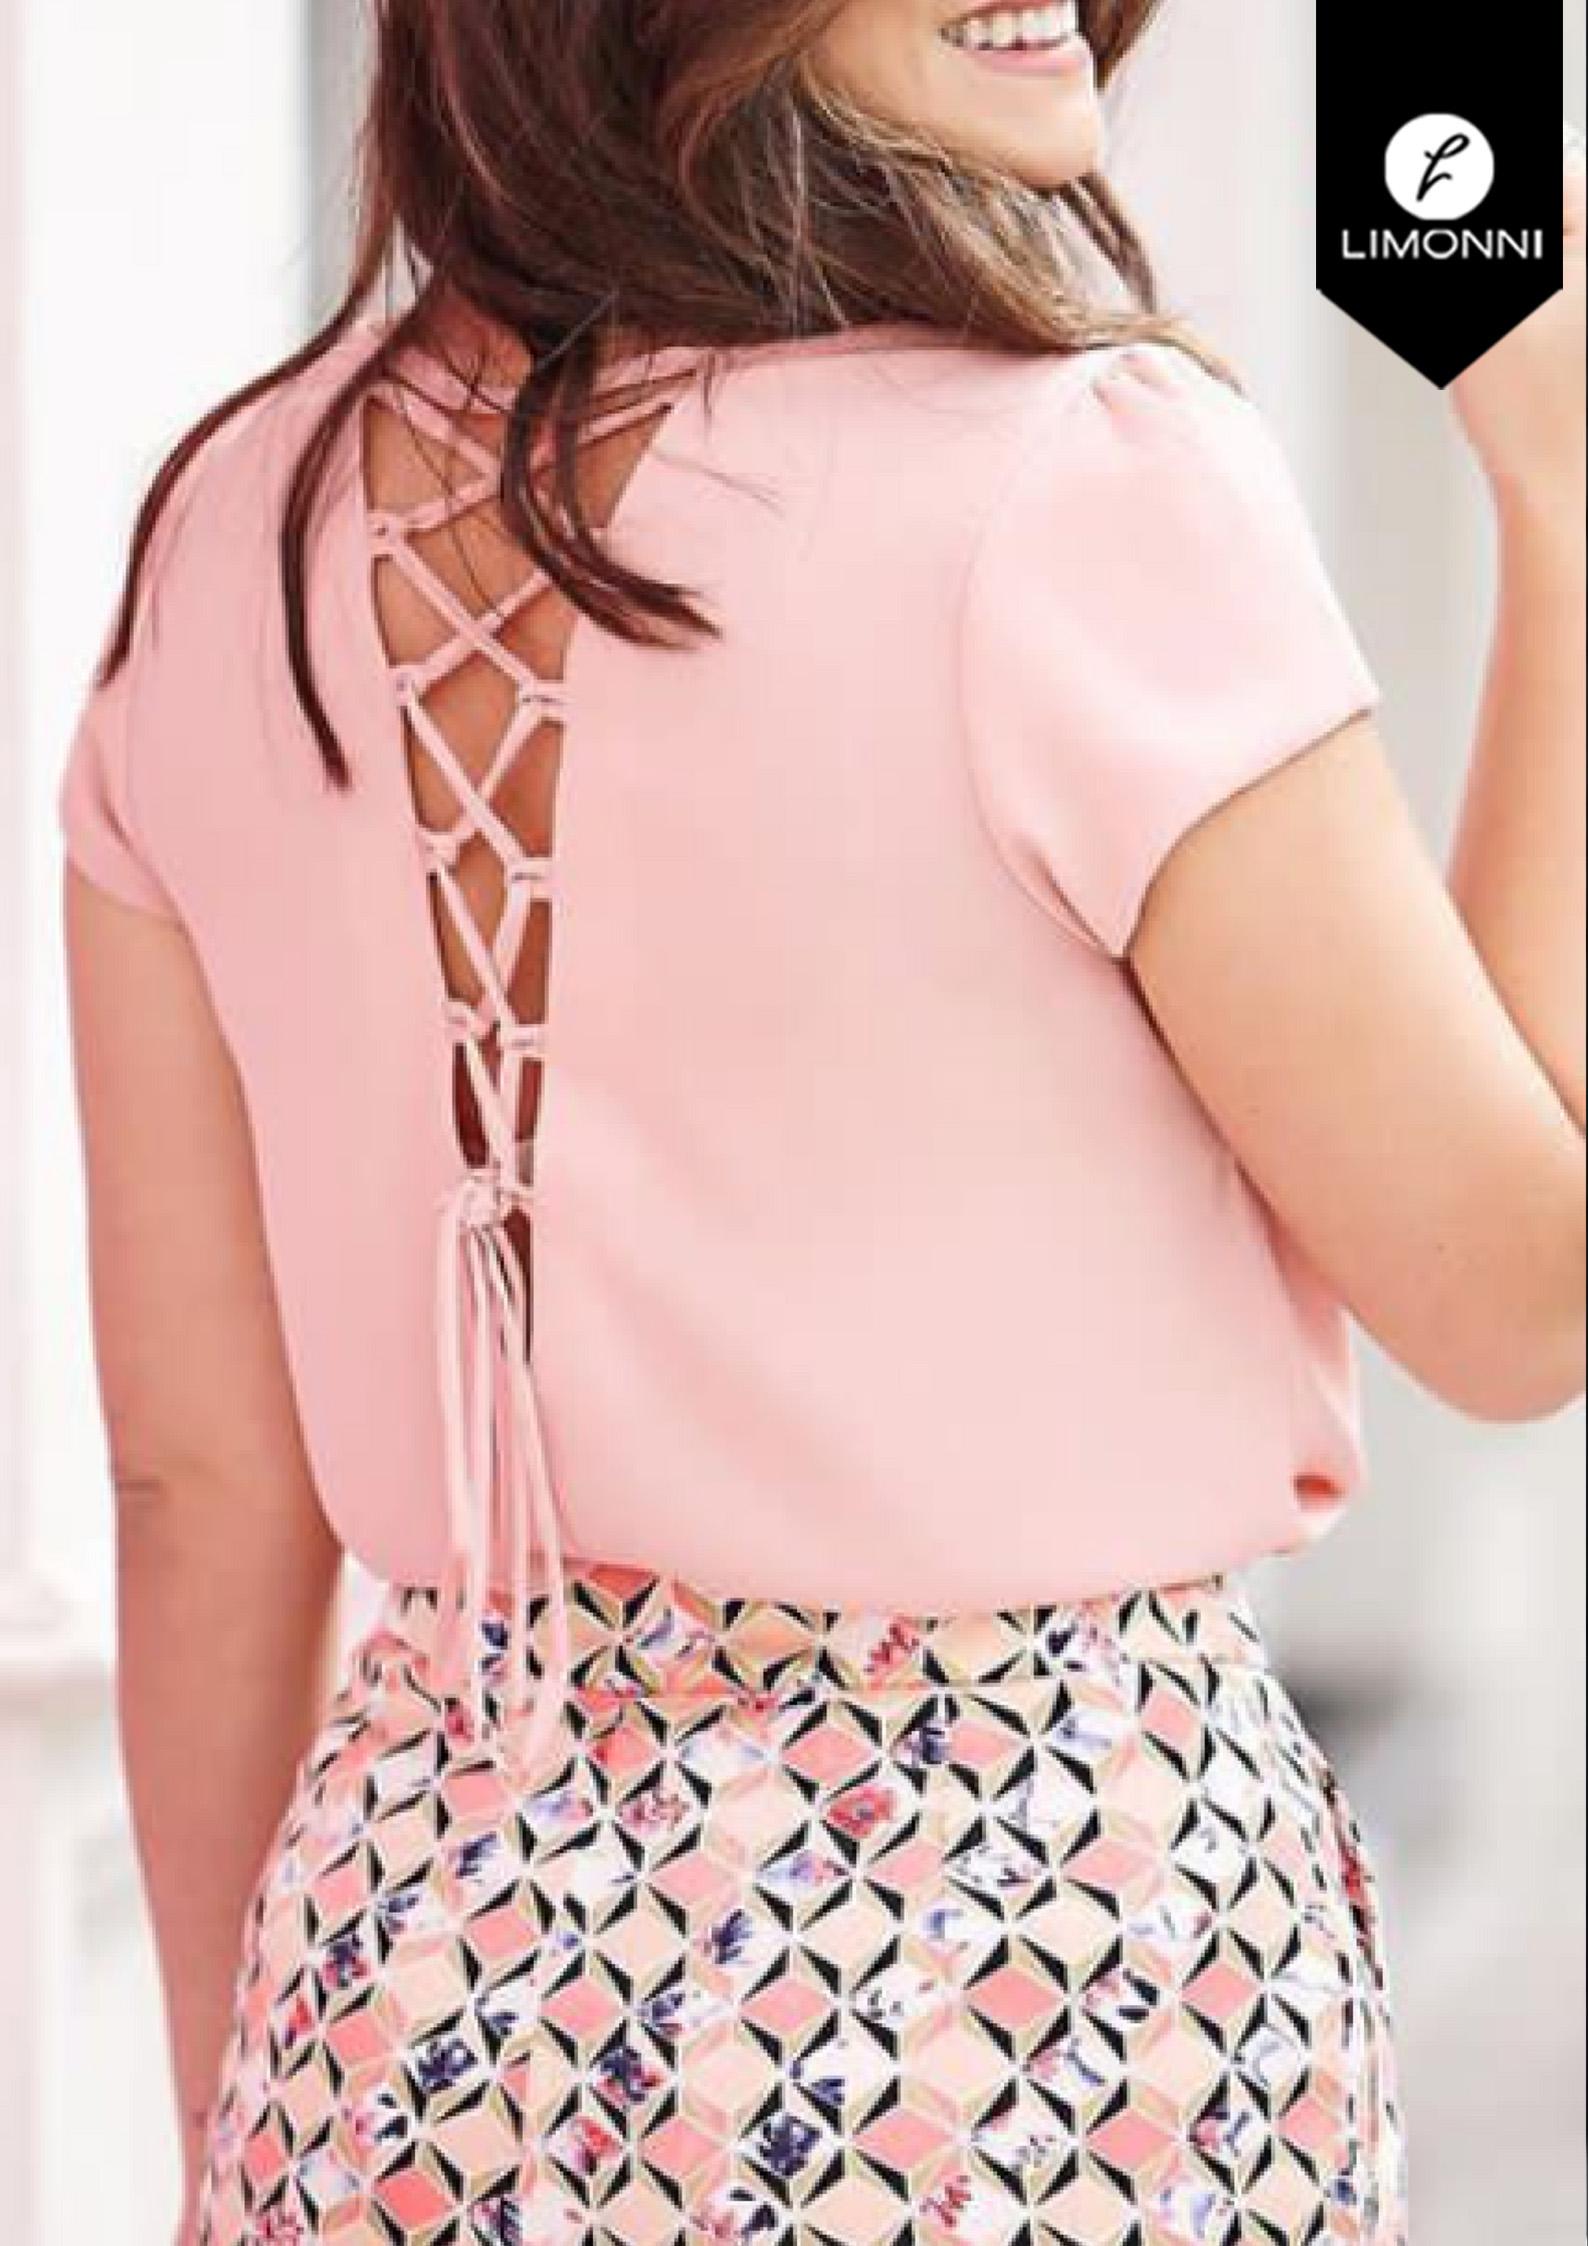 Blusas para mujer Limonni Bennett LI1364 Casuales